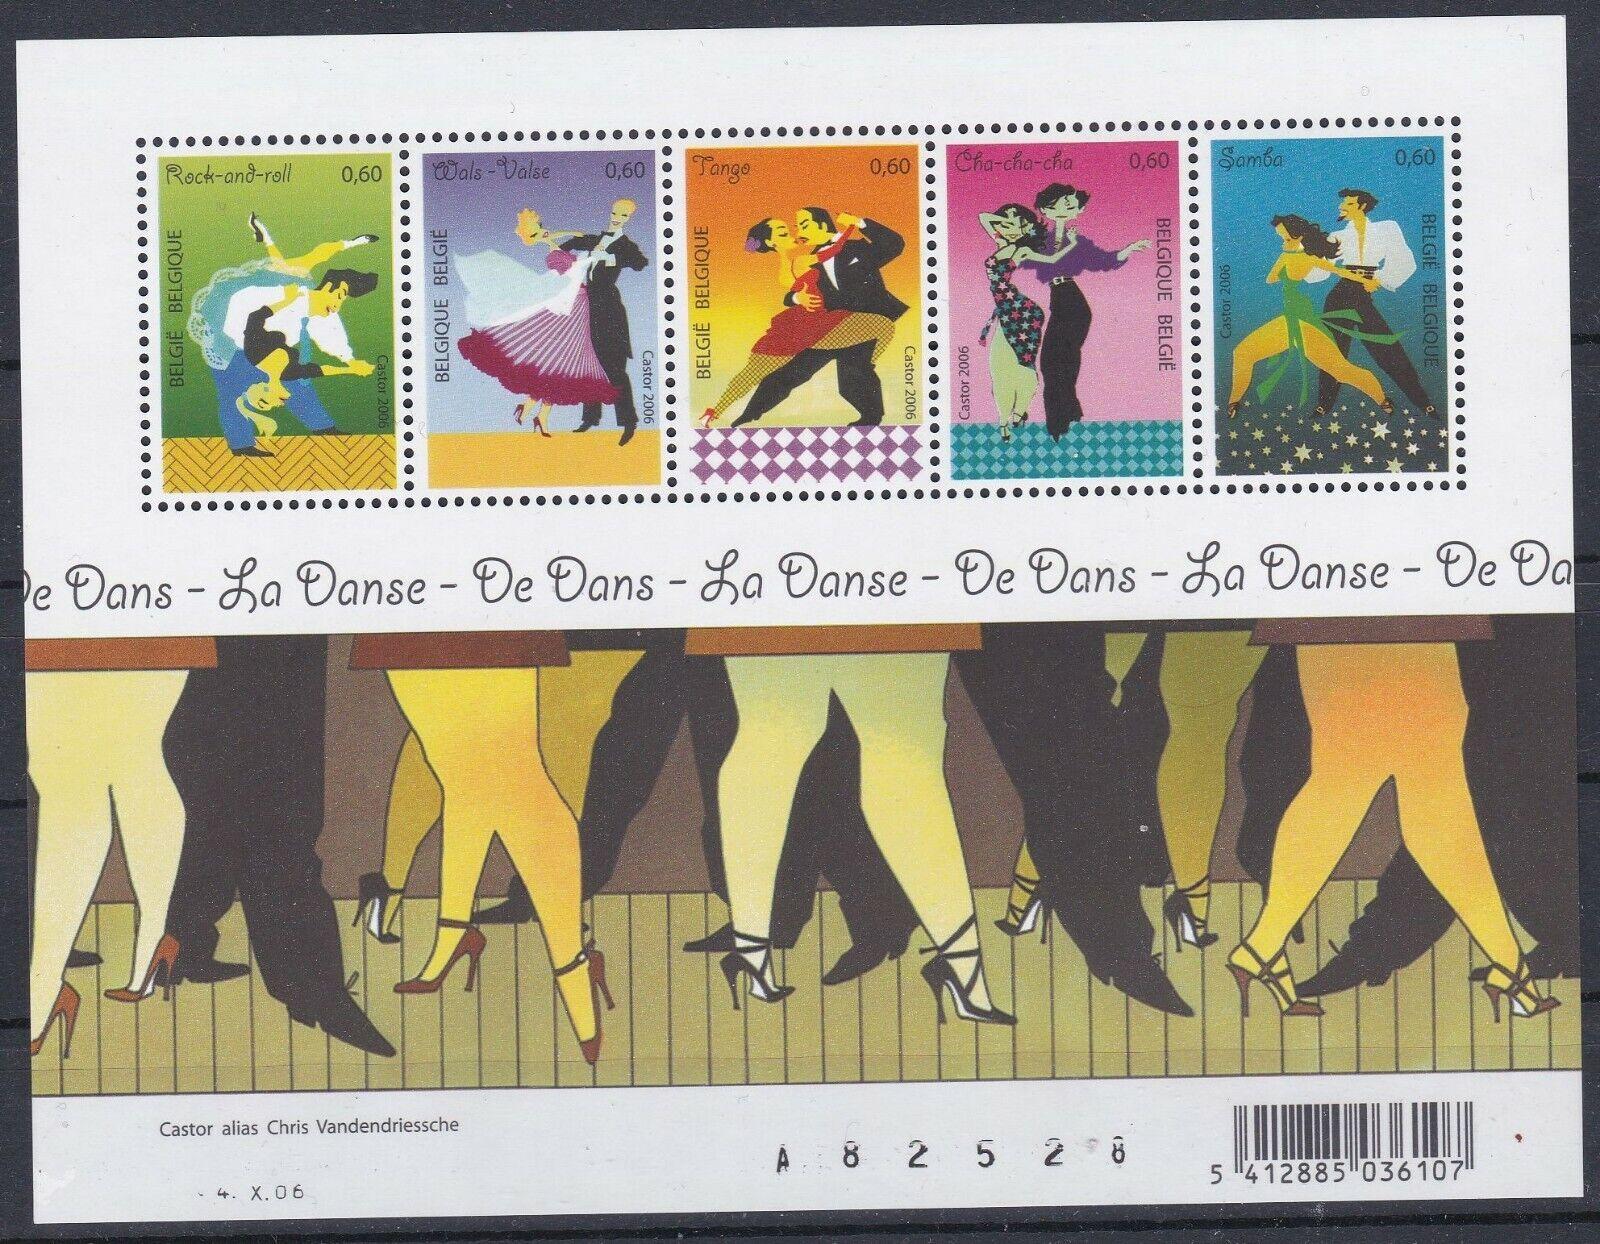 Belgique 2006 3566-70 BL 136 ** Danses Rock Valse Tango Cha-cha-cha Samba